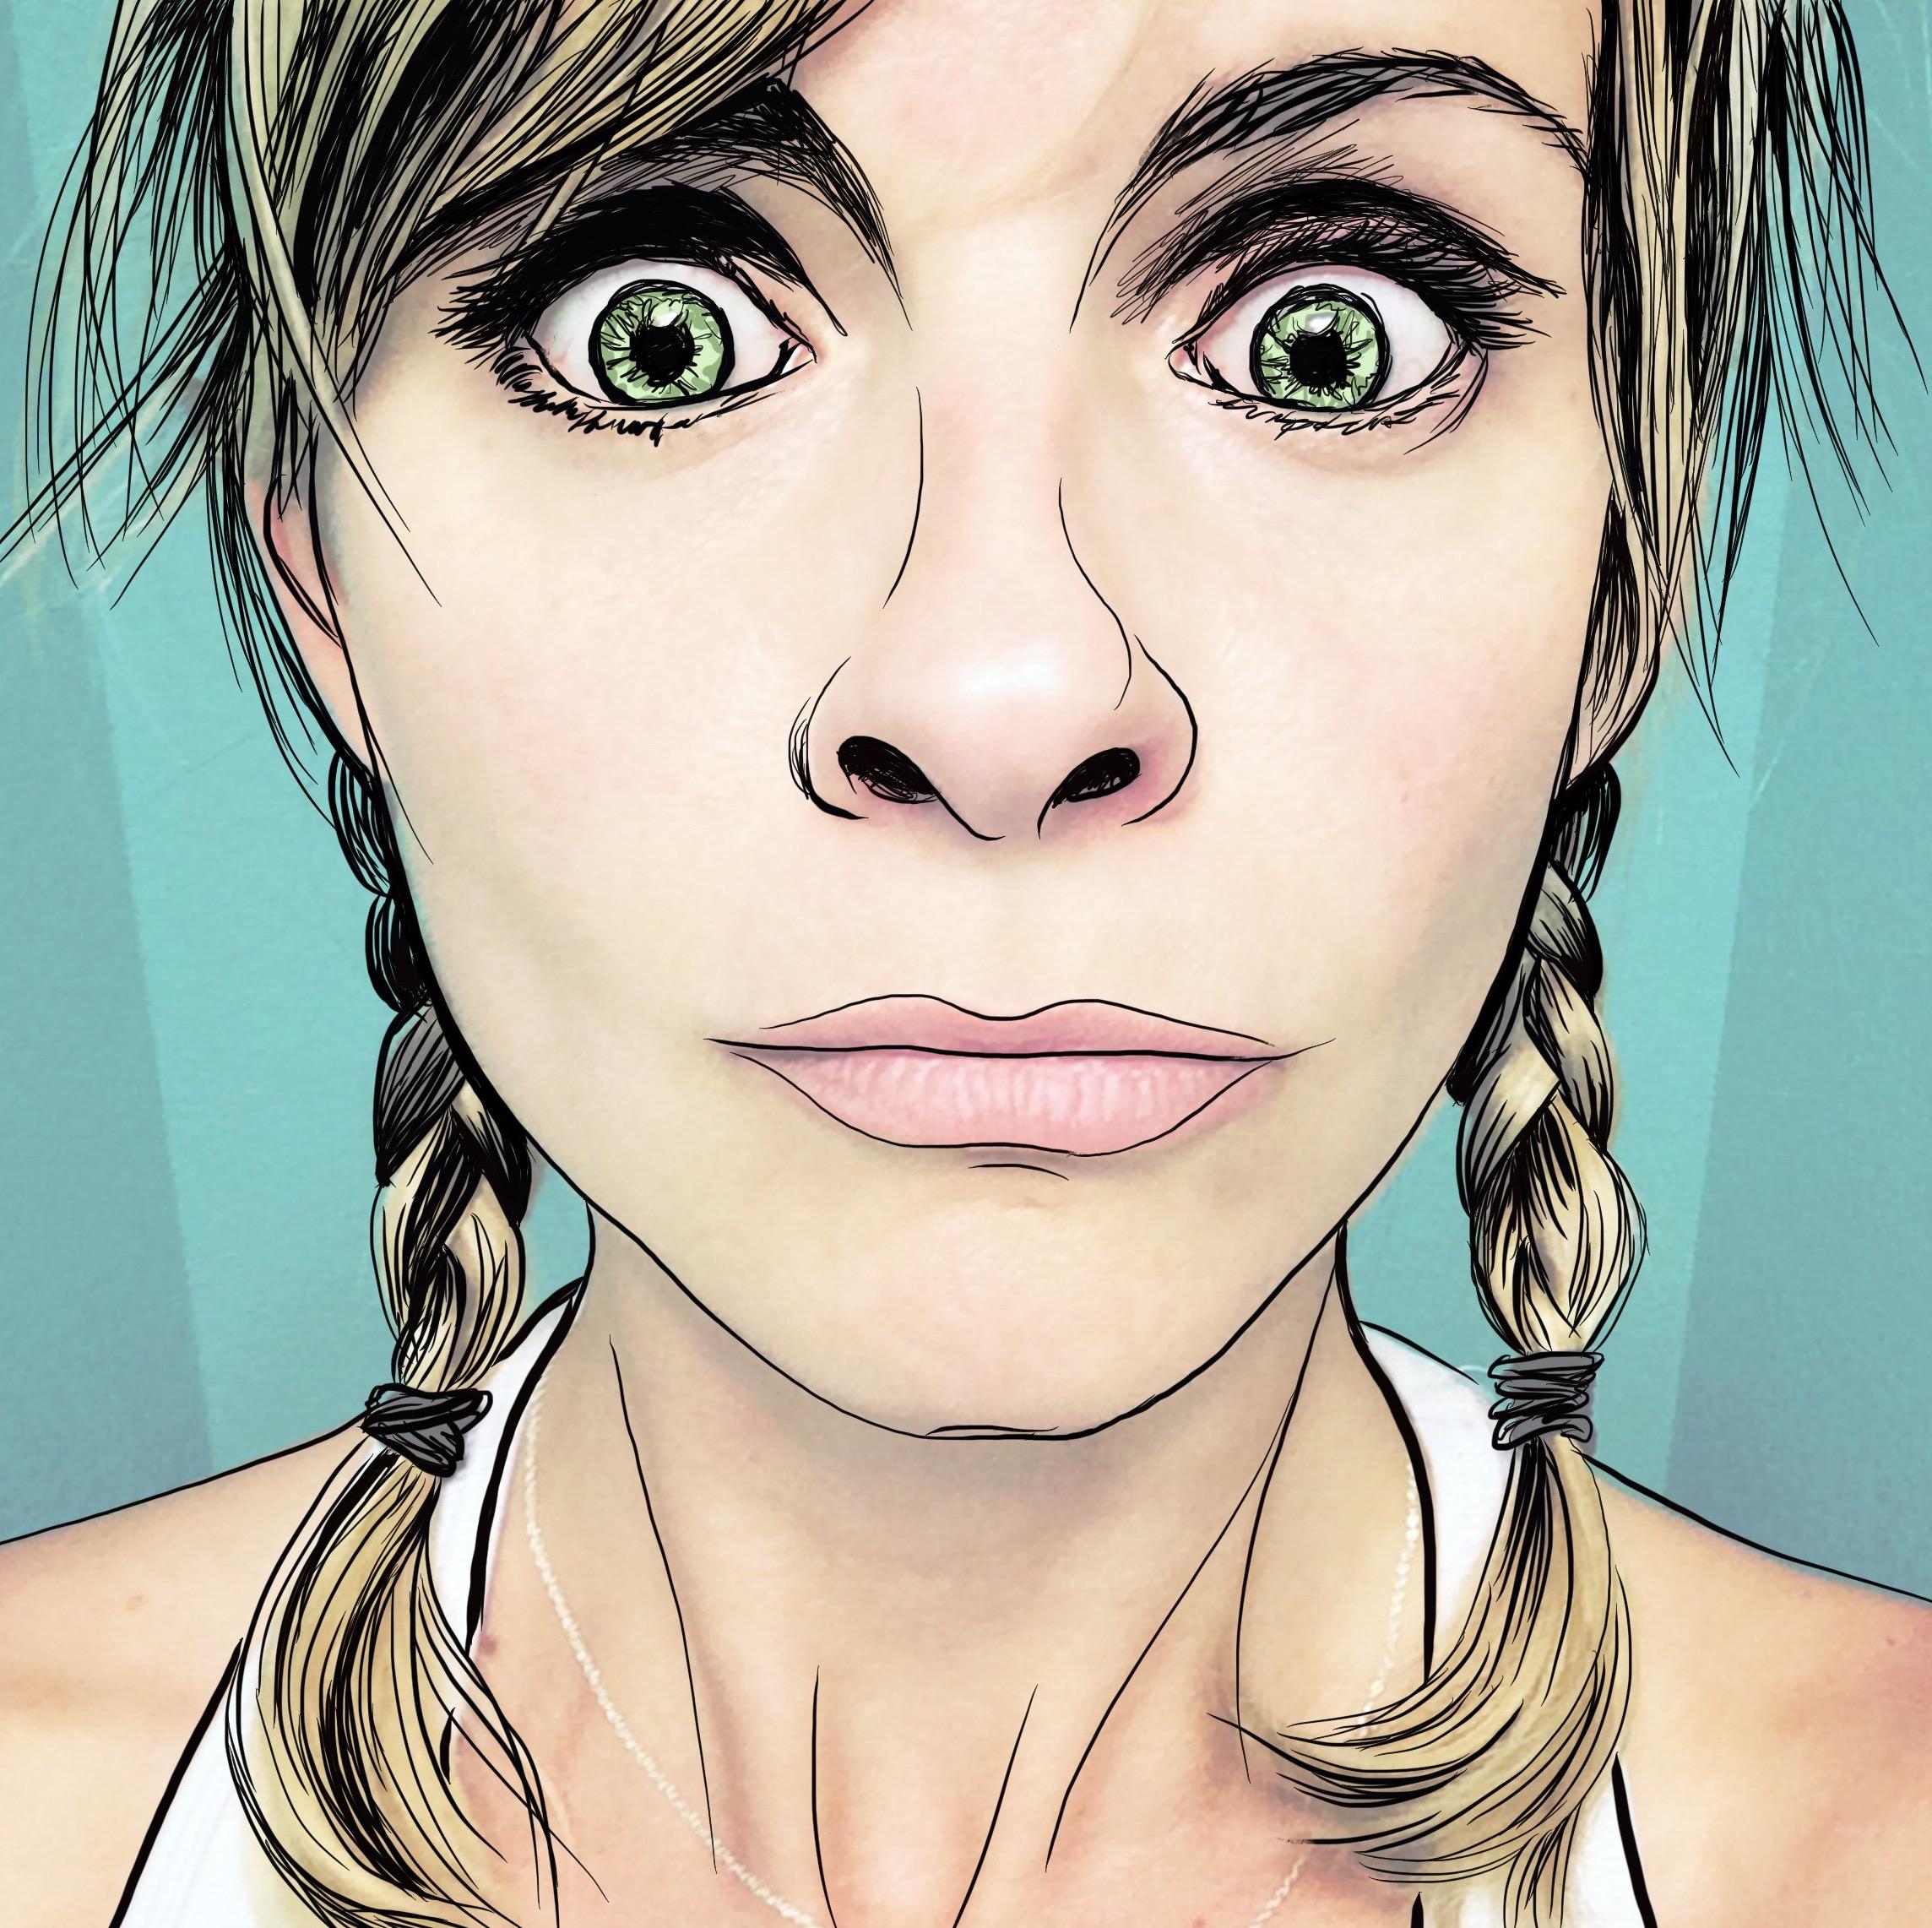 Goofy Self Portrait